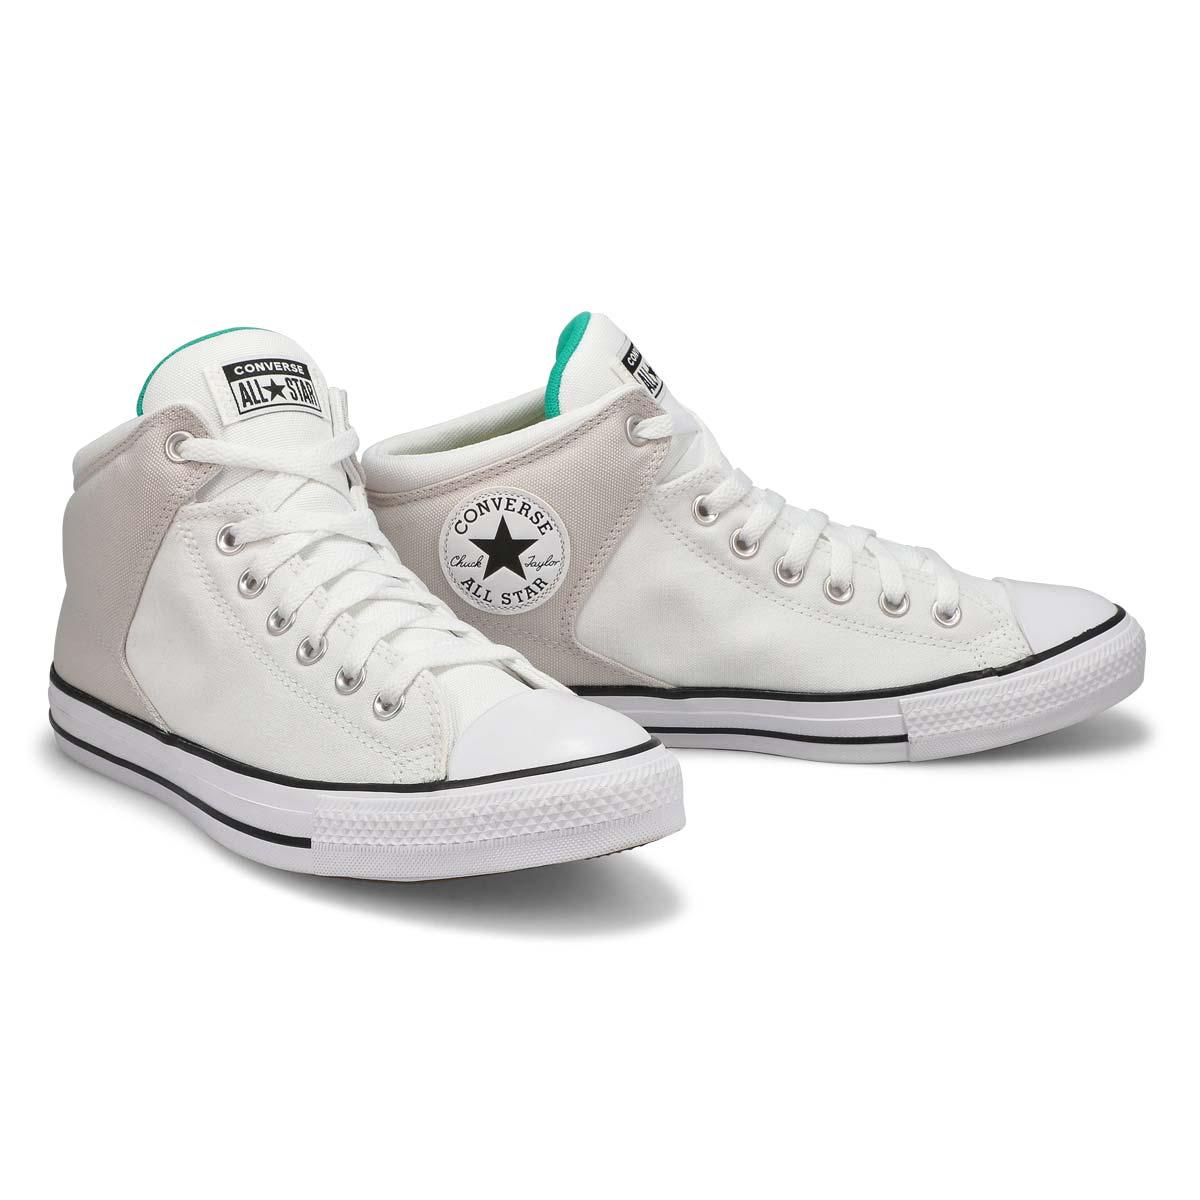 Men's All Star High Street Hi Top Sneaker